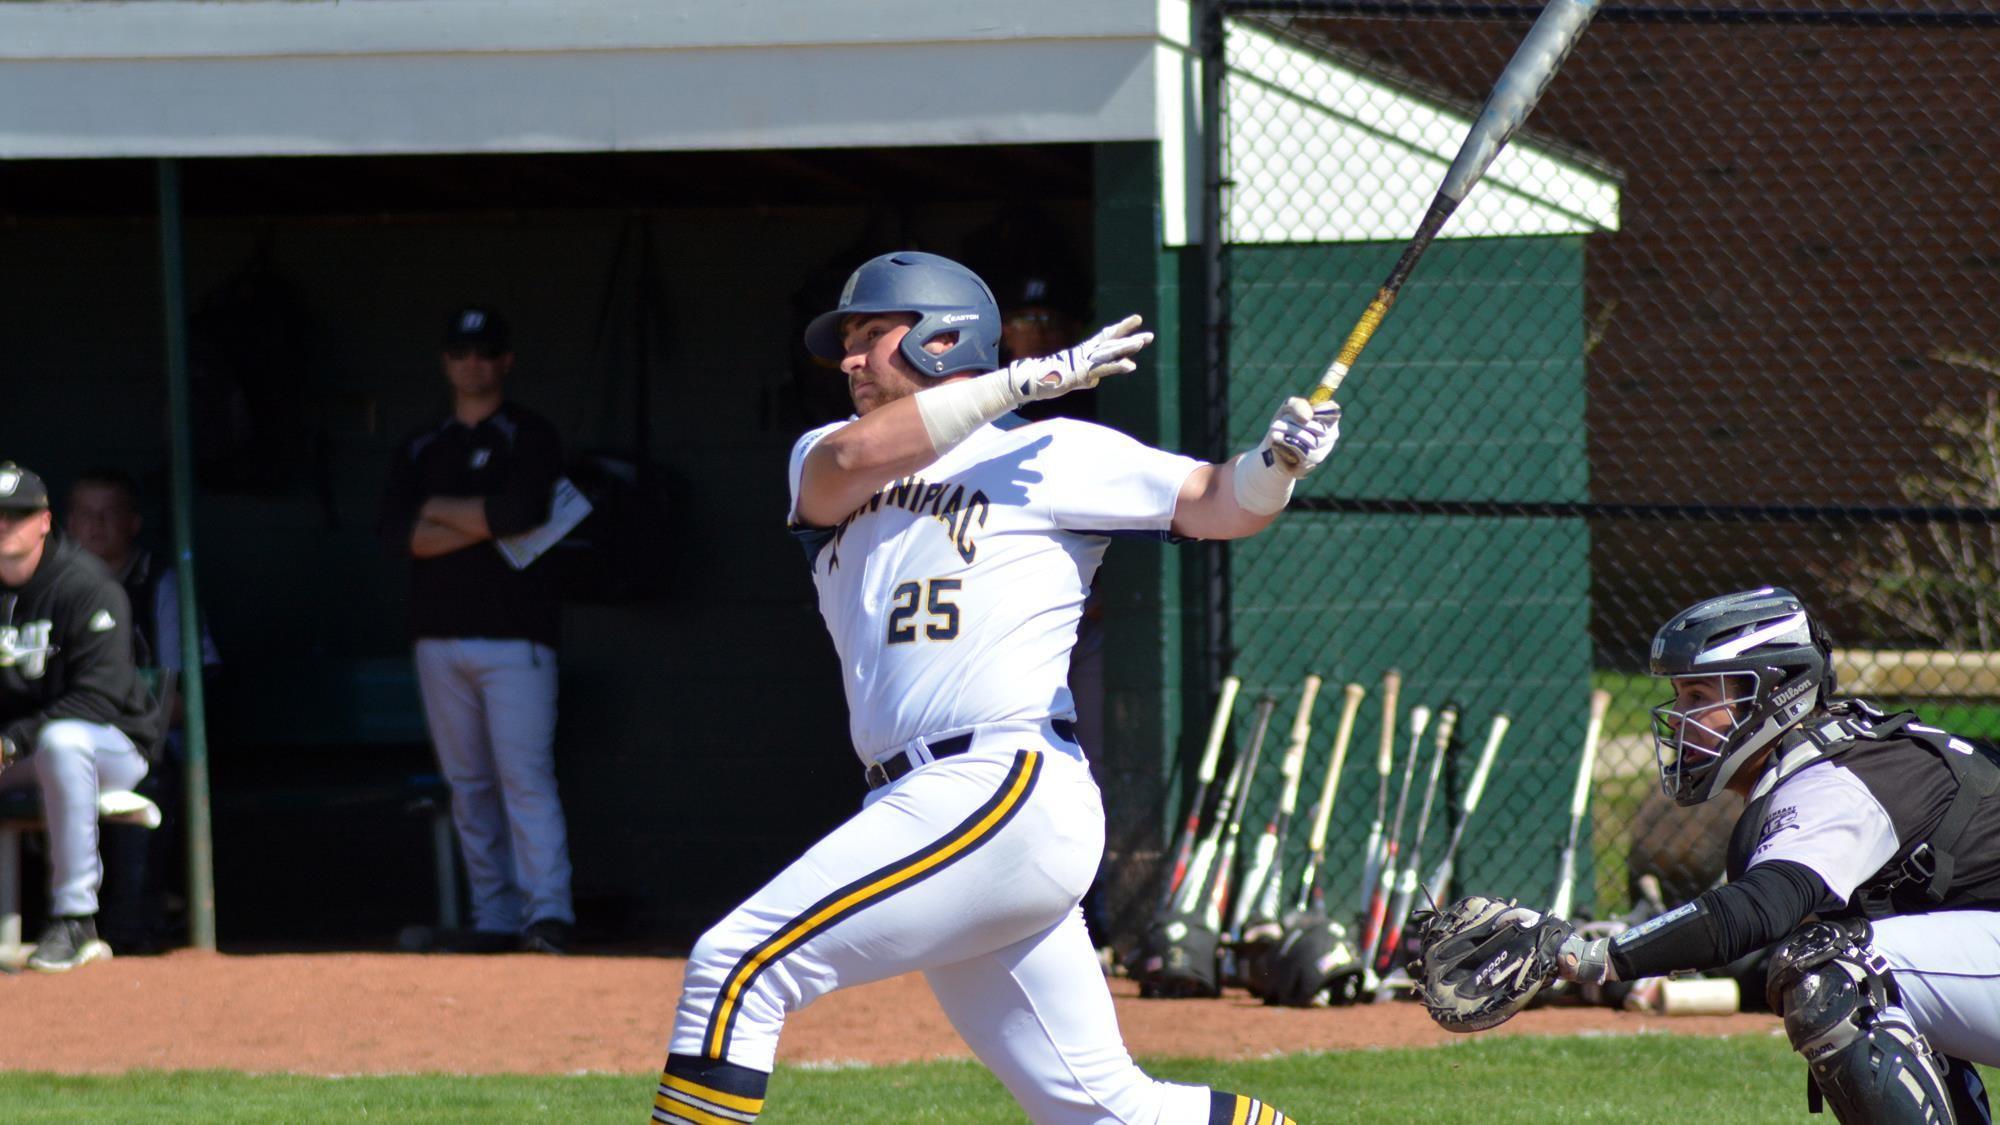 Quinnipiac baseball drops a nail biter to Bryant, 7-6